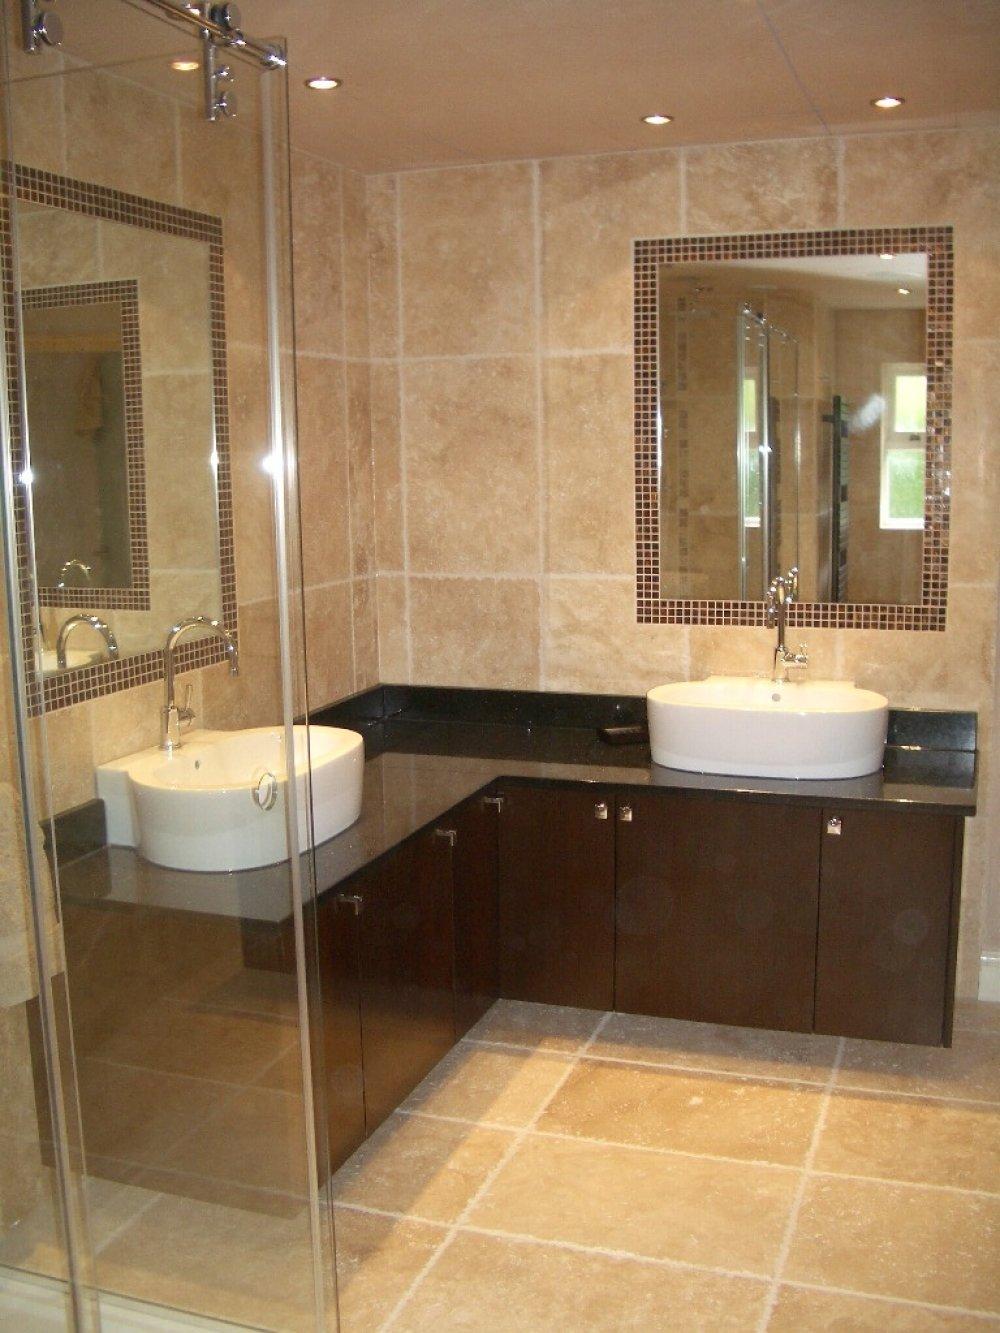 his and hers bathroom vessel sink   lovelyspaces.com